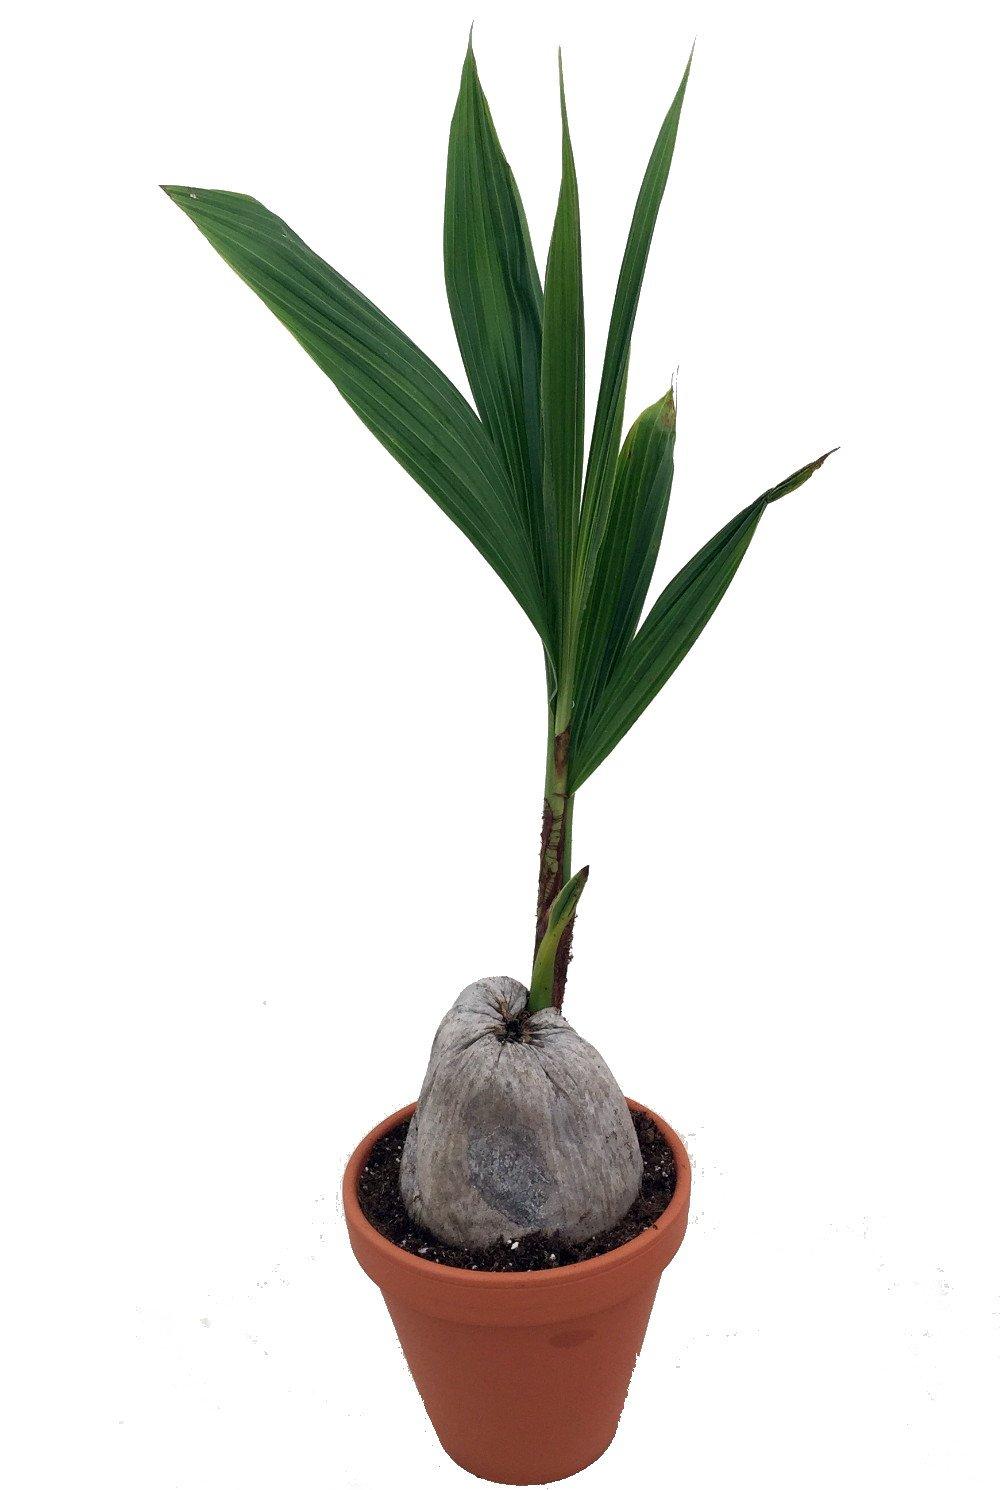 Malayan Dwarf Coconut Palm - Cocos nucifera - 6'' Clay Pot - Easy to Grow